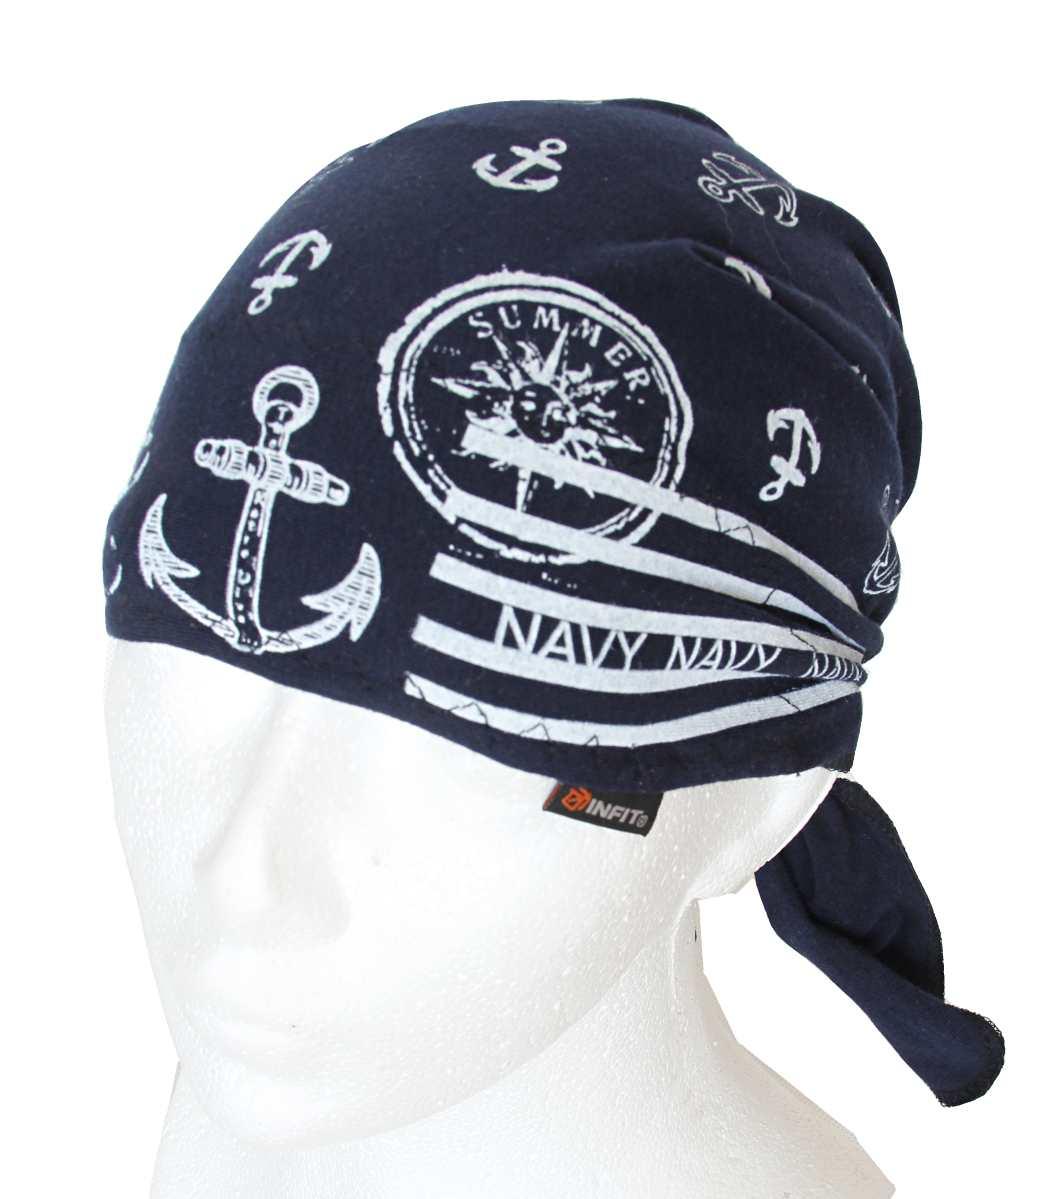 Dětský pirát trojúhelníkový šátek tmavě modrý vzor Námořník. d36046954b